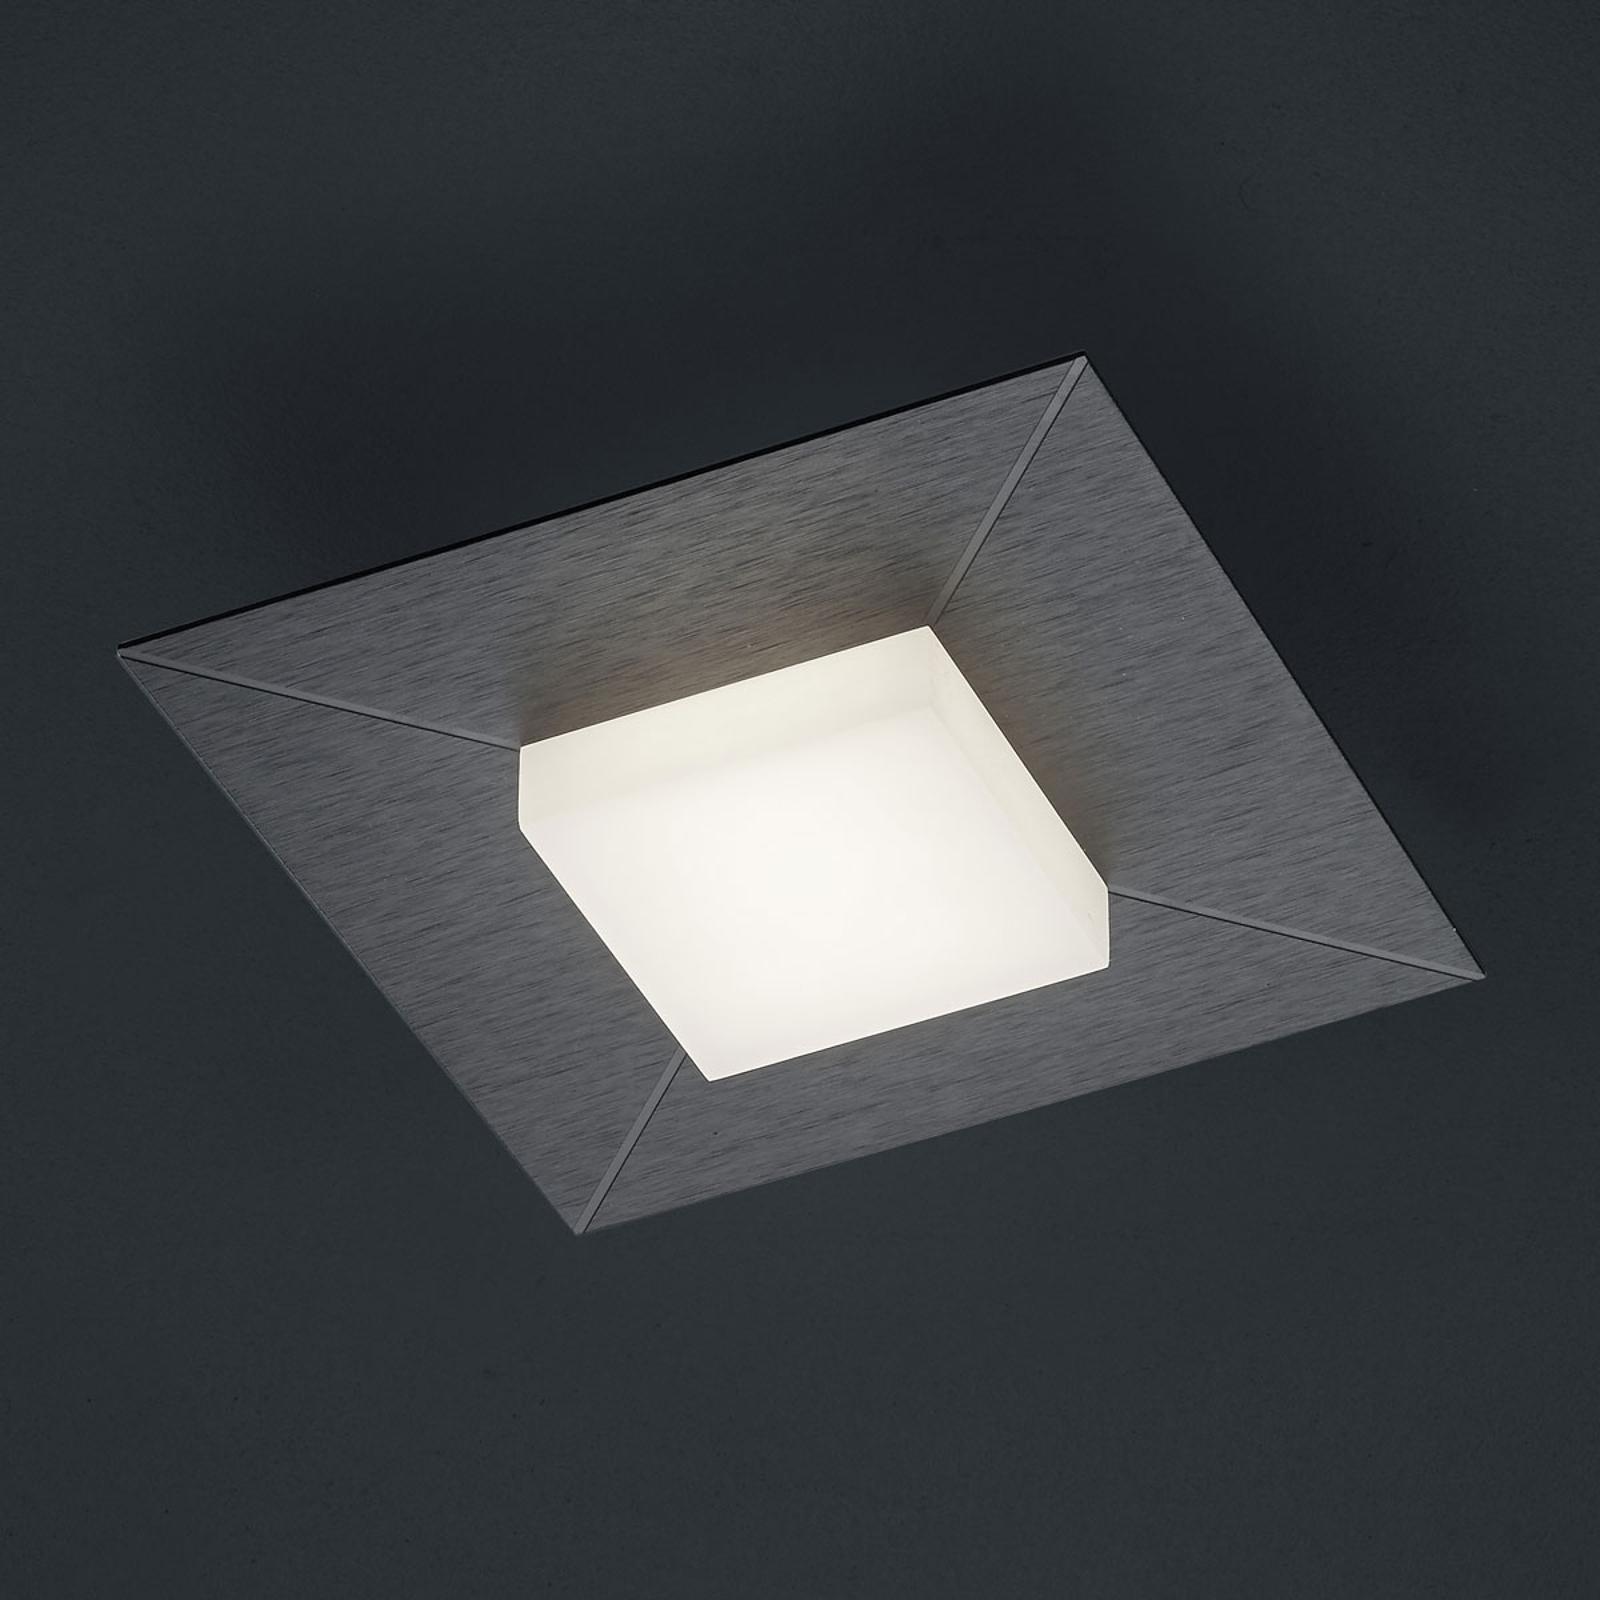 Acquista BANKAMP Diamond plafoniera 17x17cm